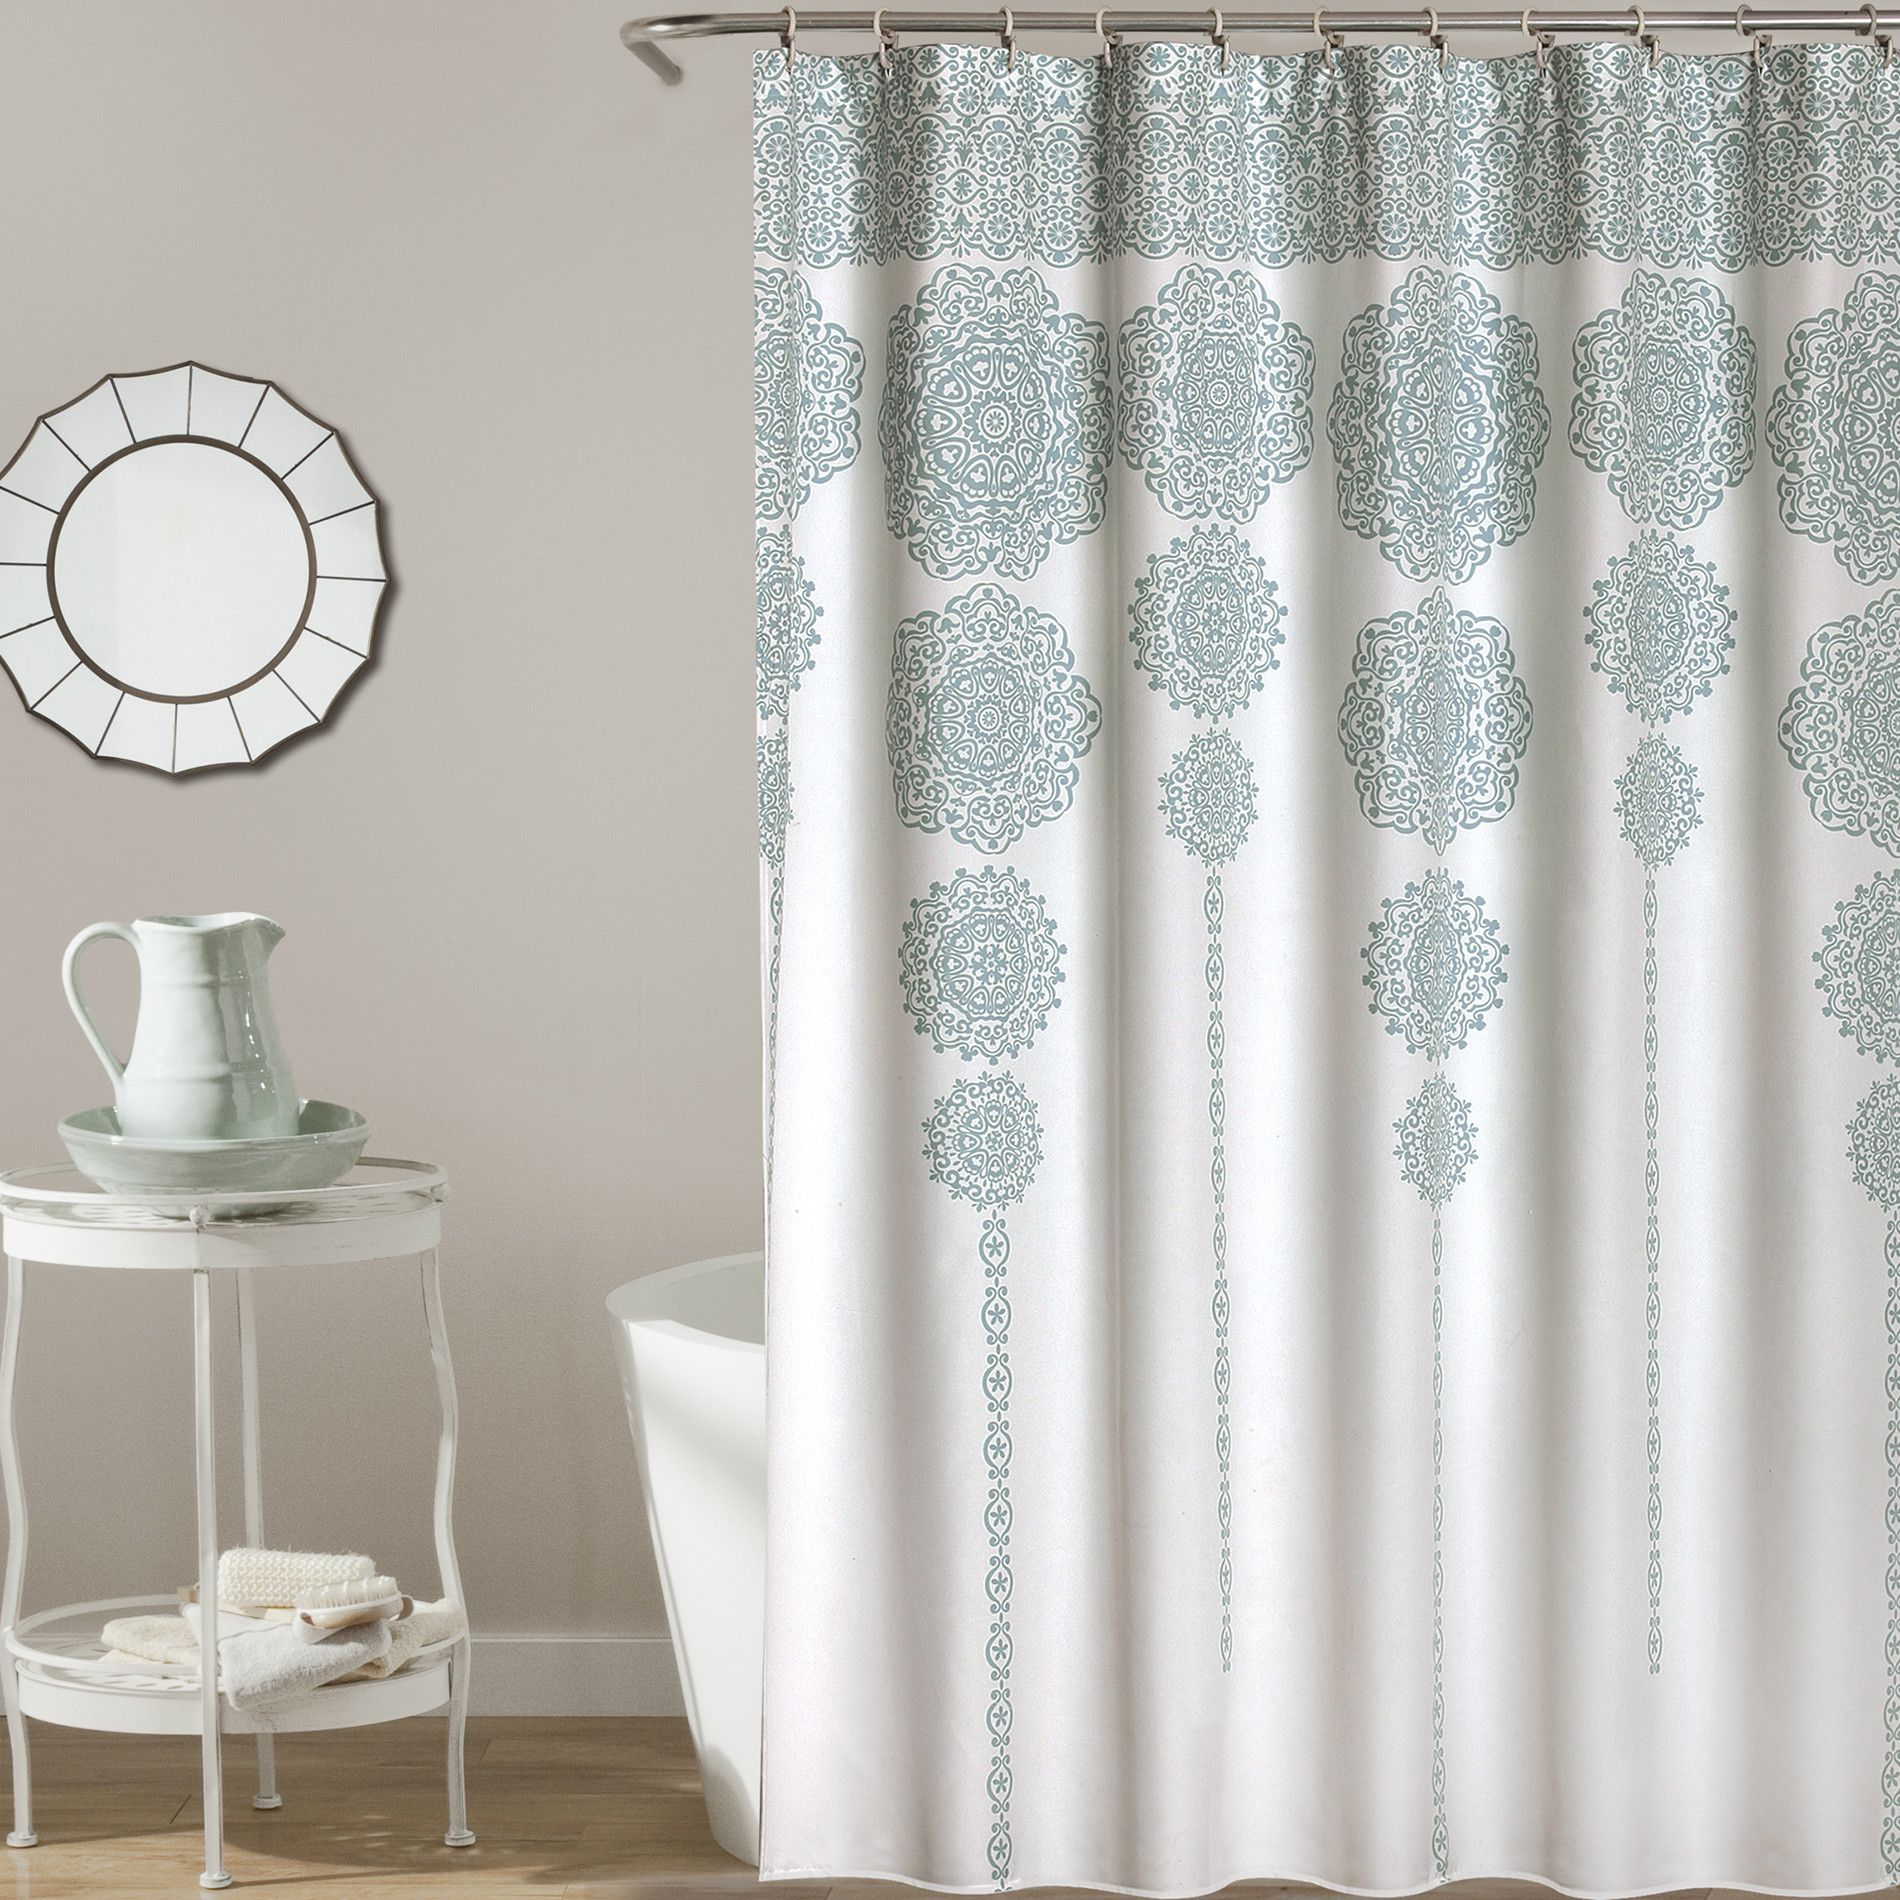 Nemeara Shower Curtain | Products | Pinterest